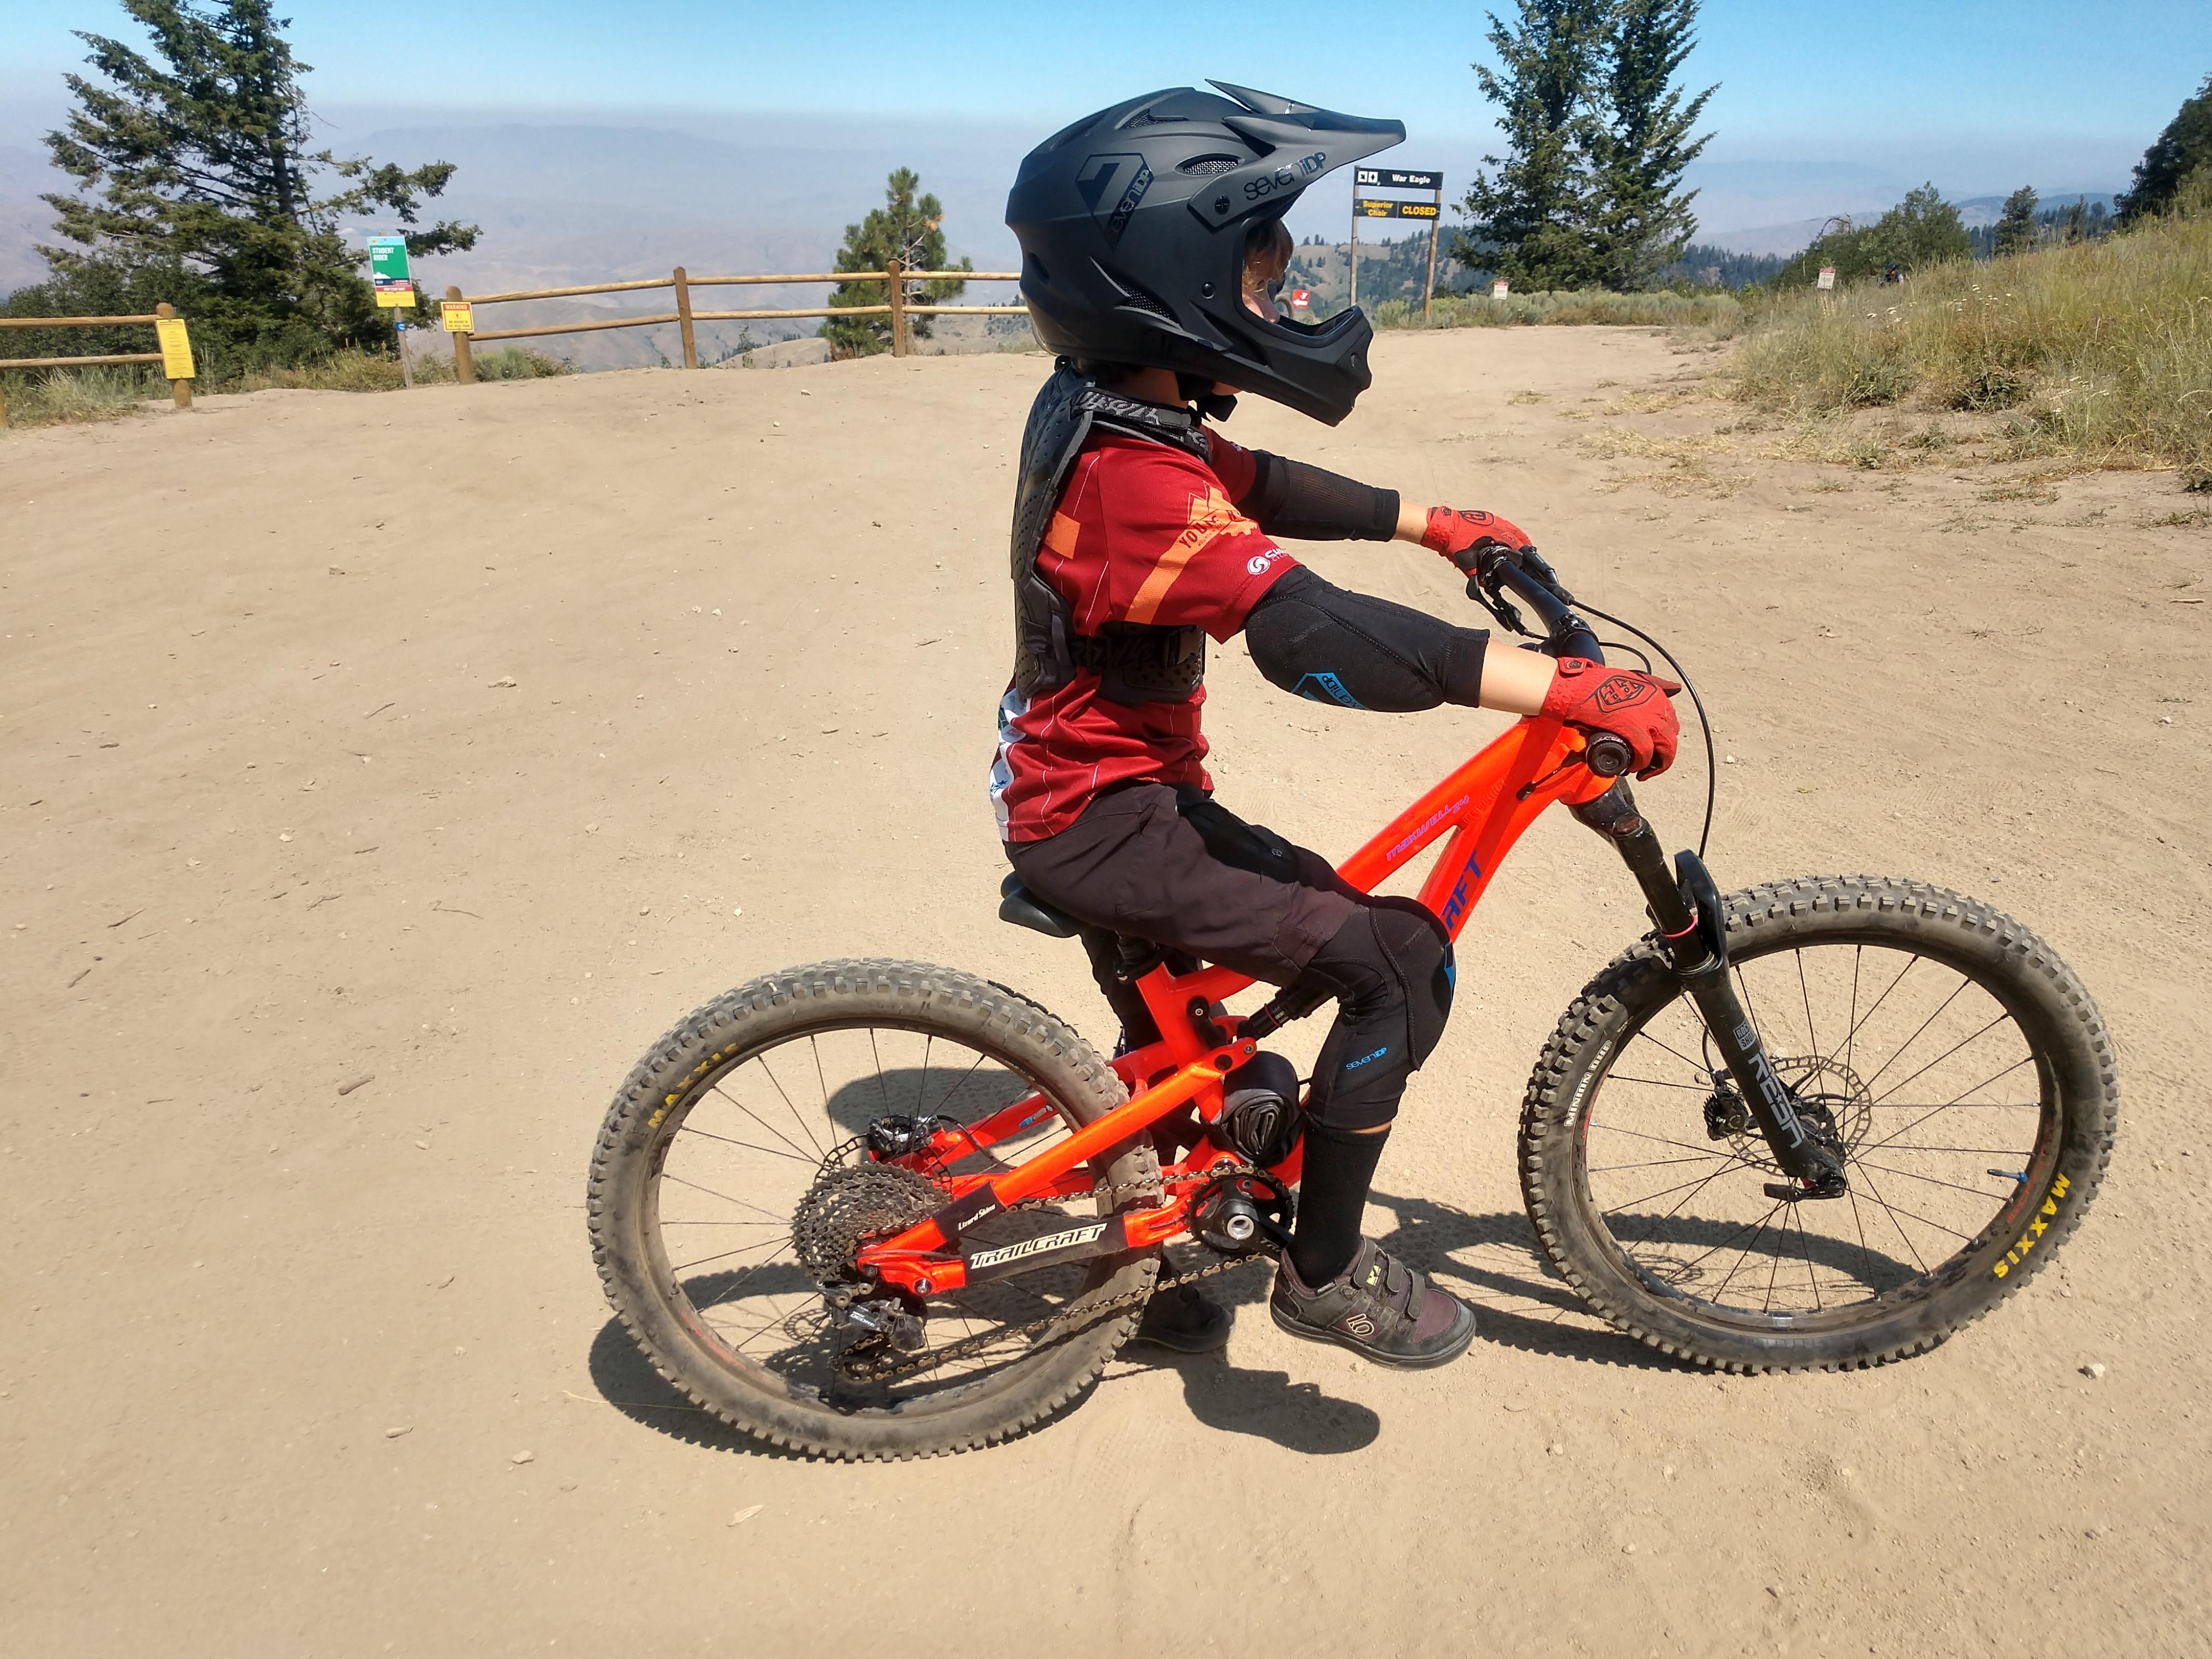 7idp m1 helmet and pads